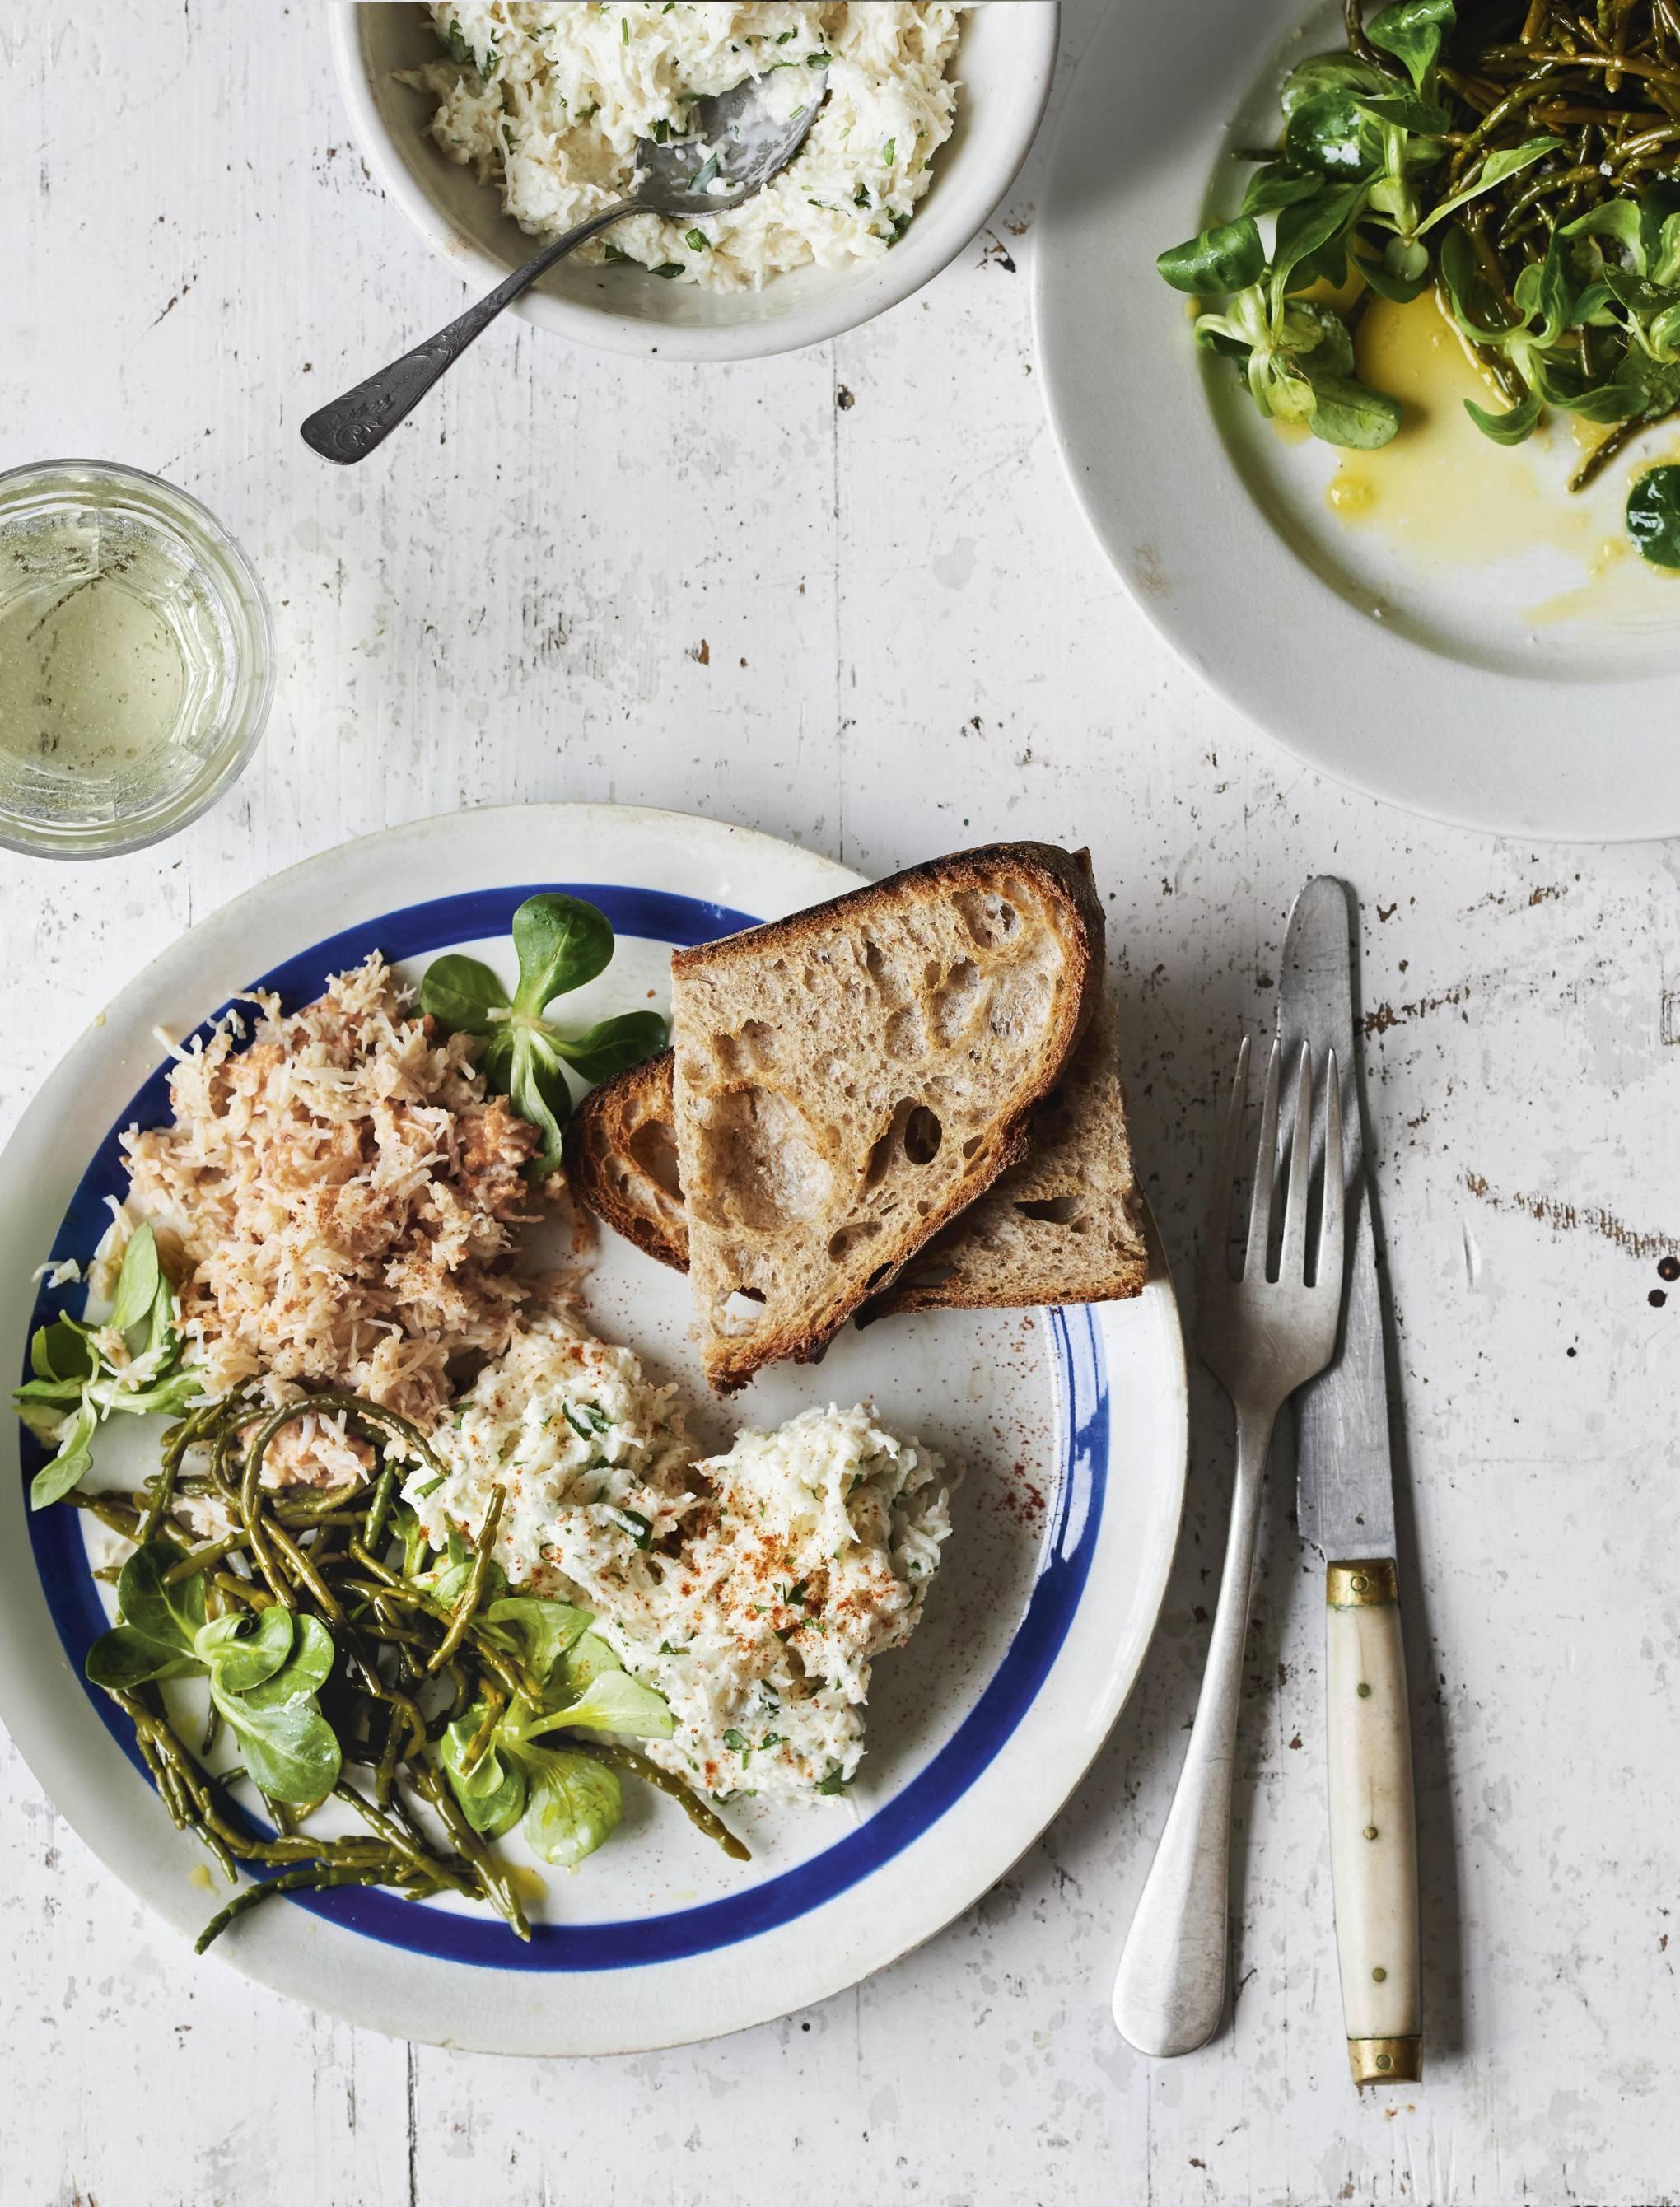 Crab, pickled samphire and radish remoulade